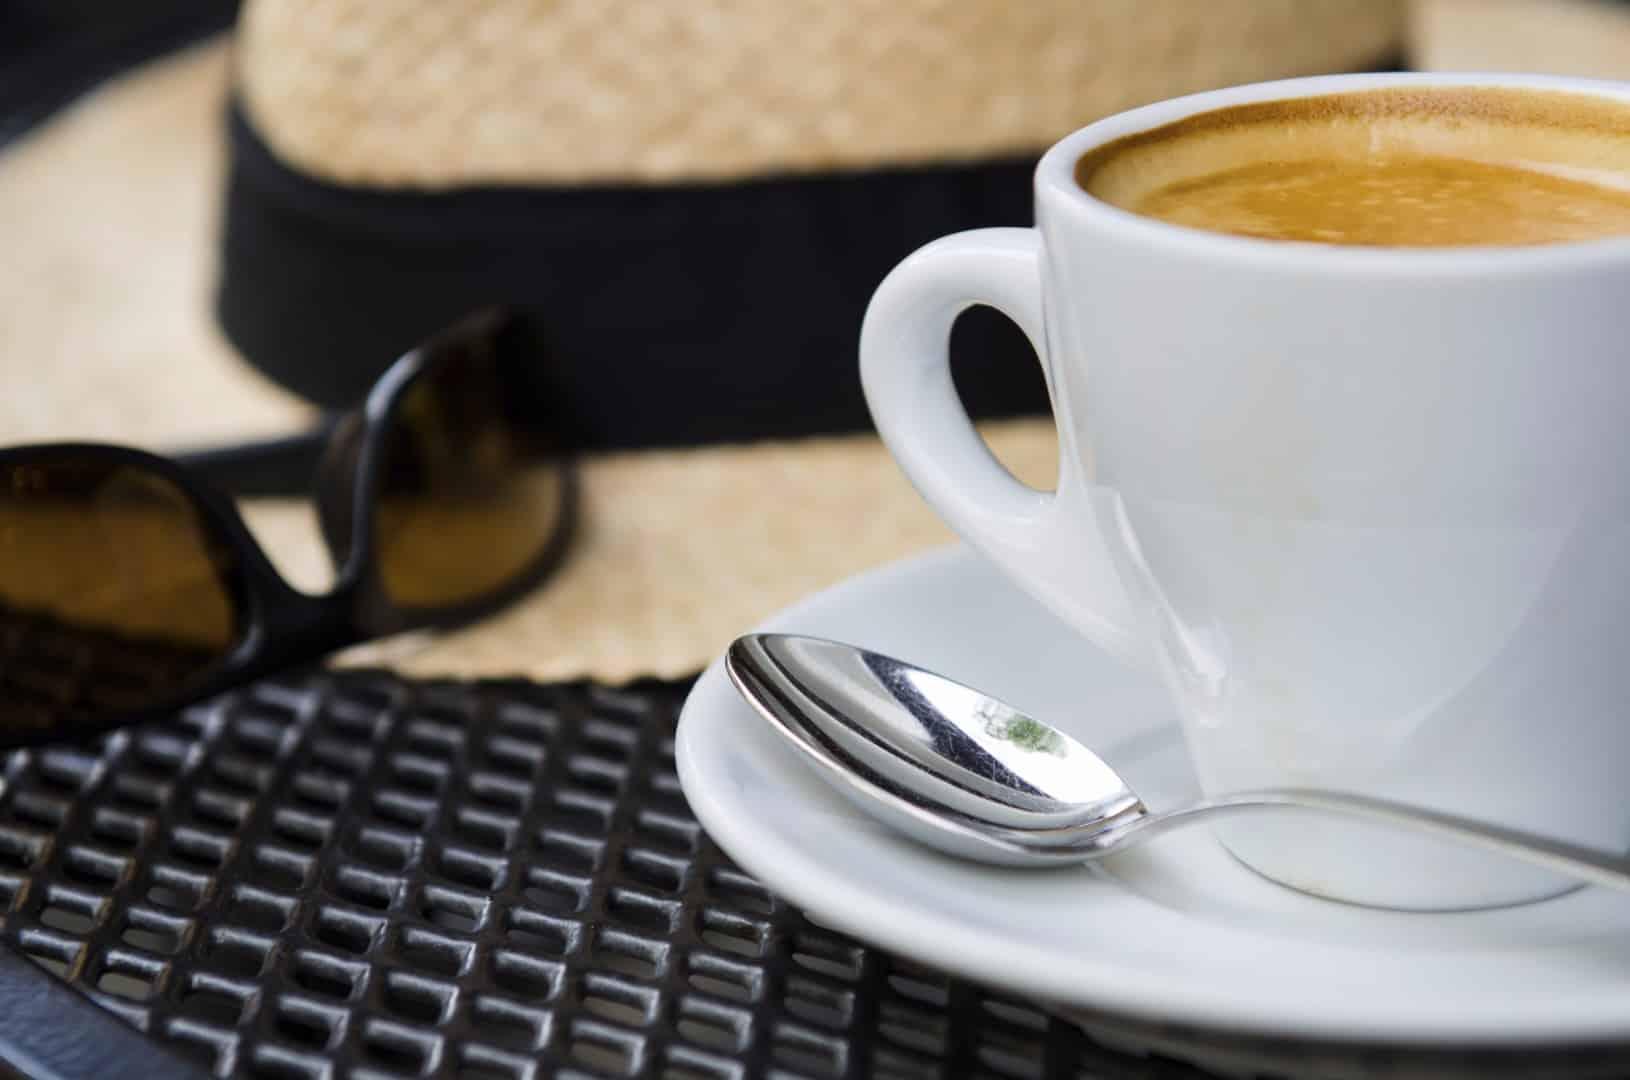 Descubre dónde tomar un buen café en Barcelona - lugares, bar-y-restaurantes